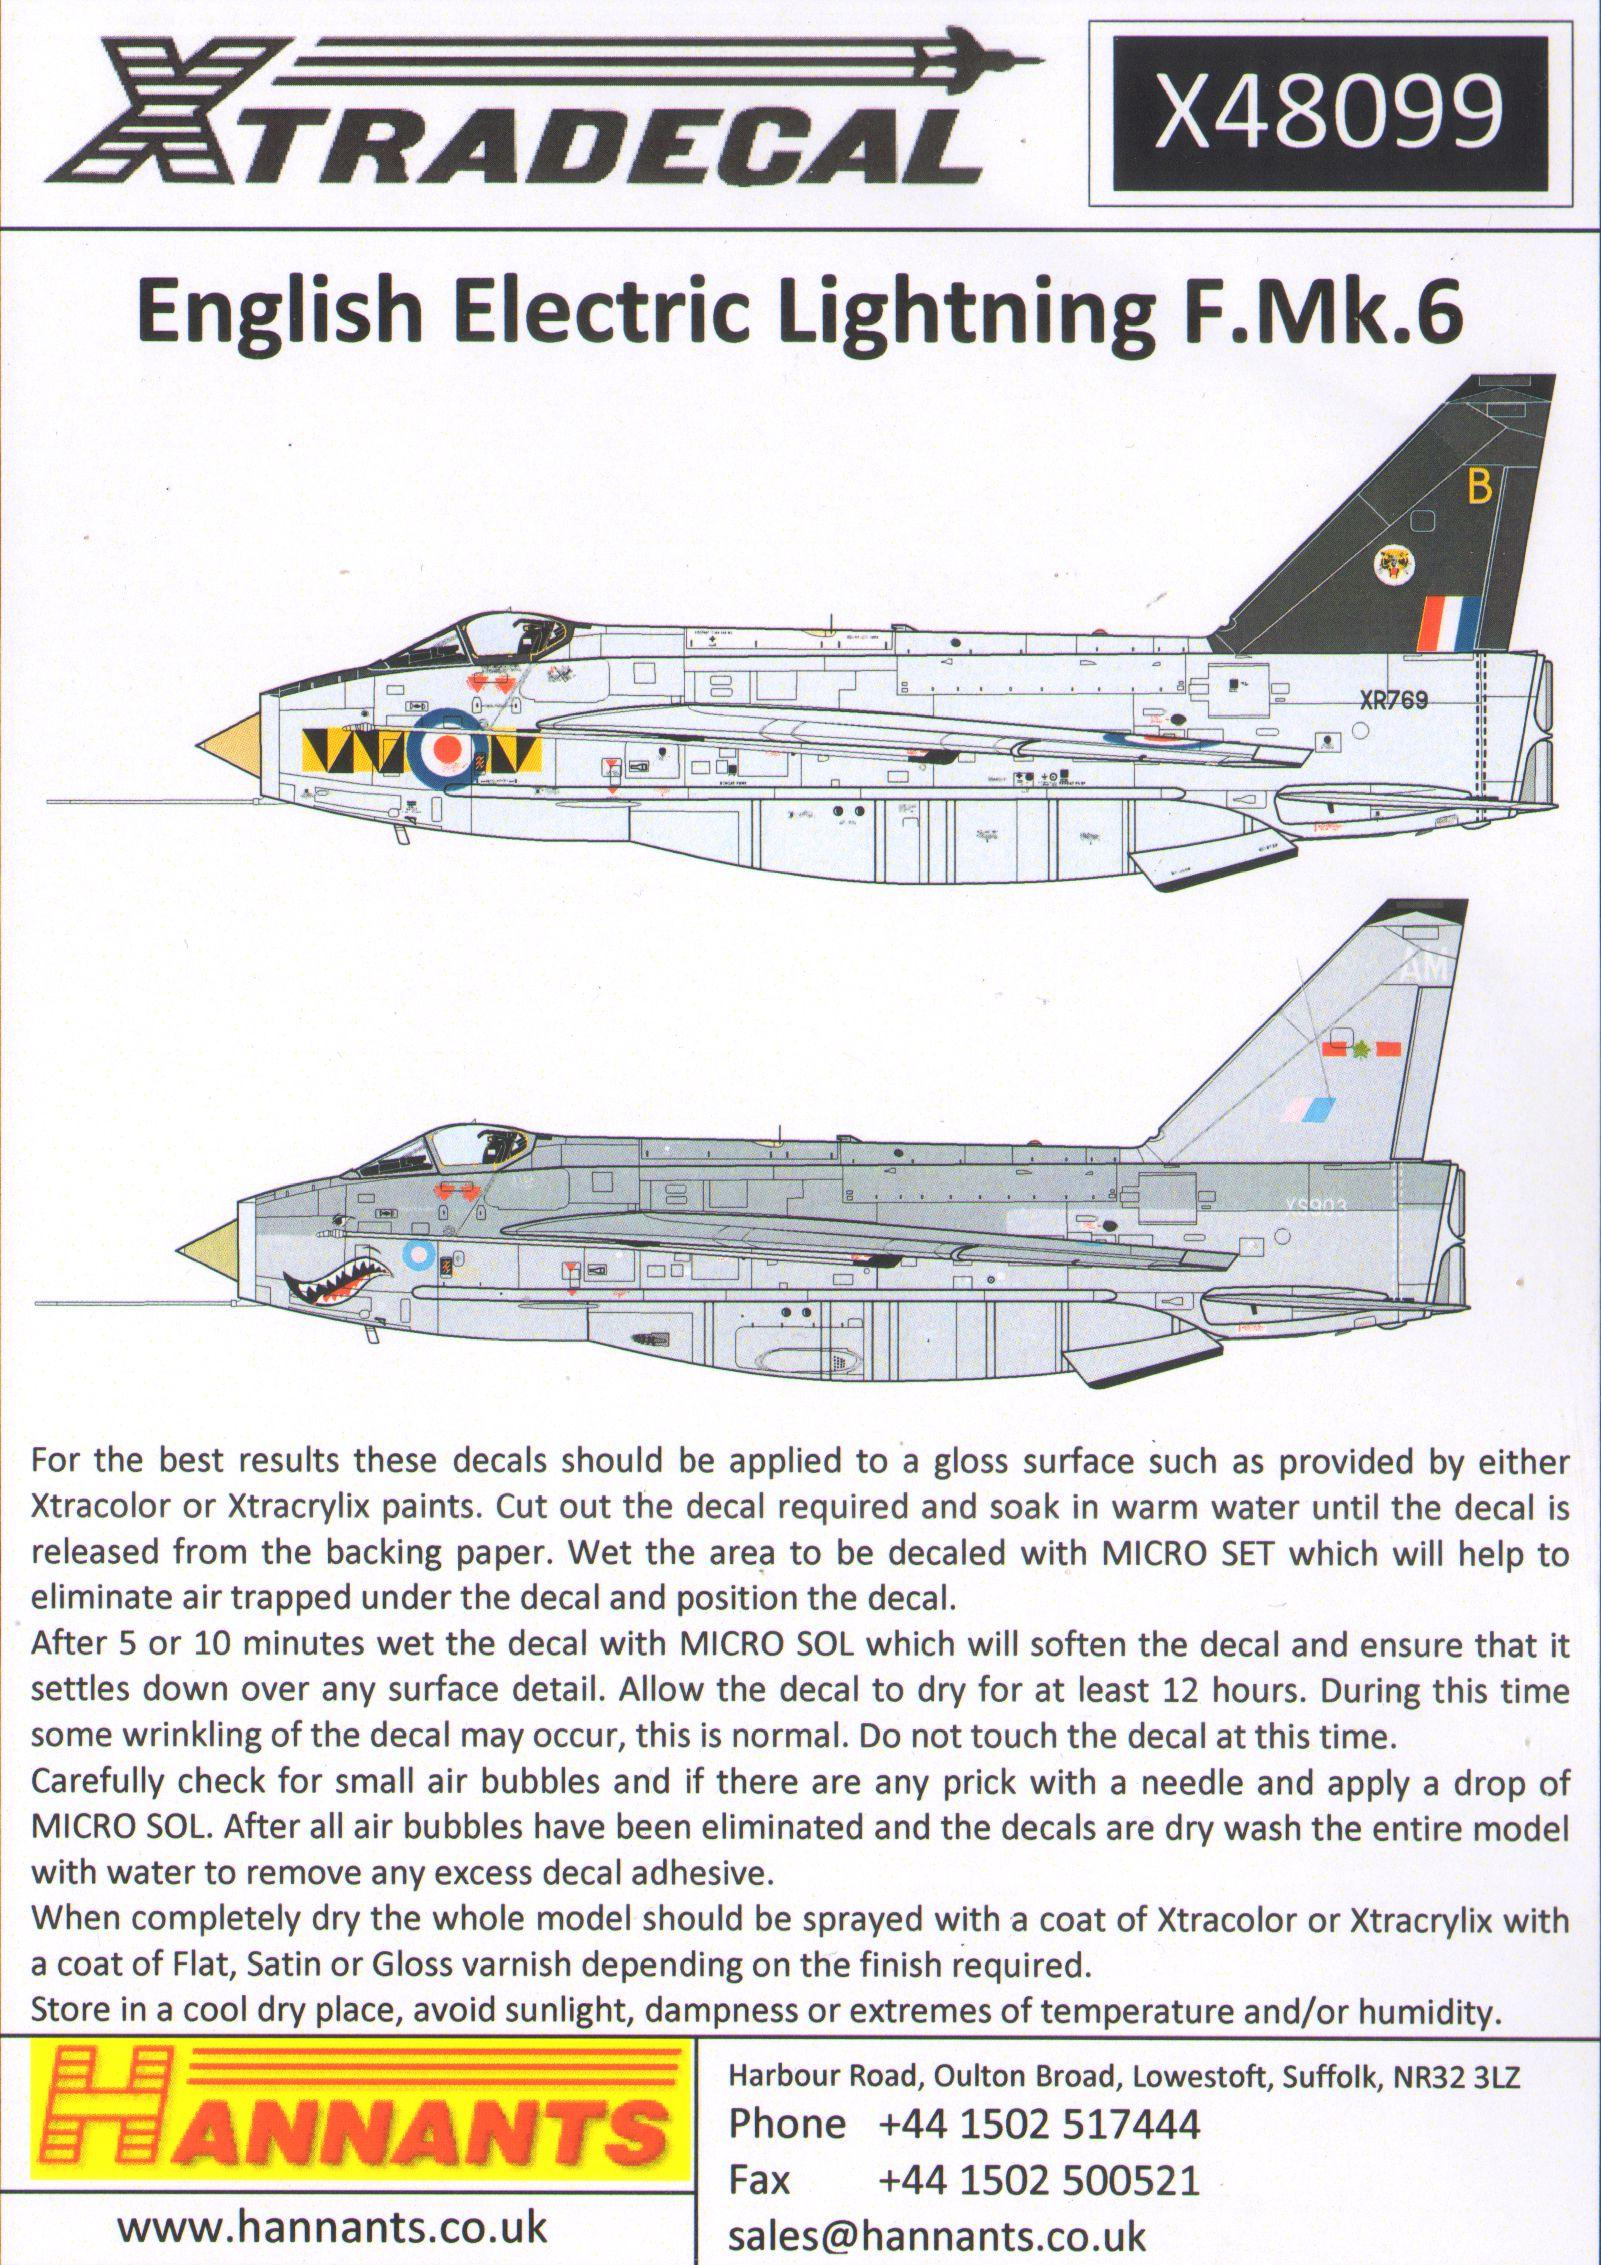 Xtradecal Aircraft decals - X48099 | Hannants